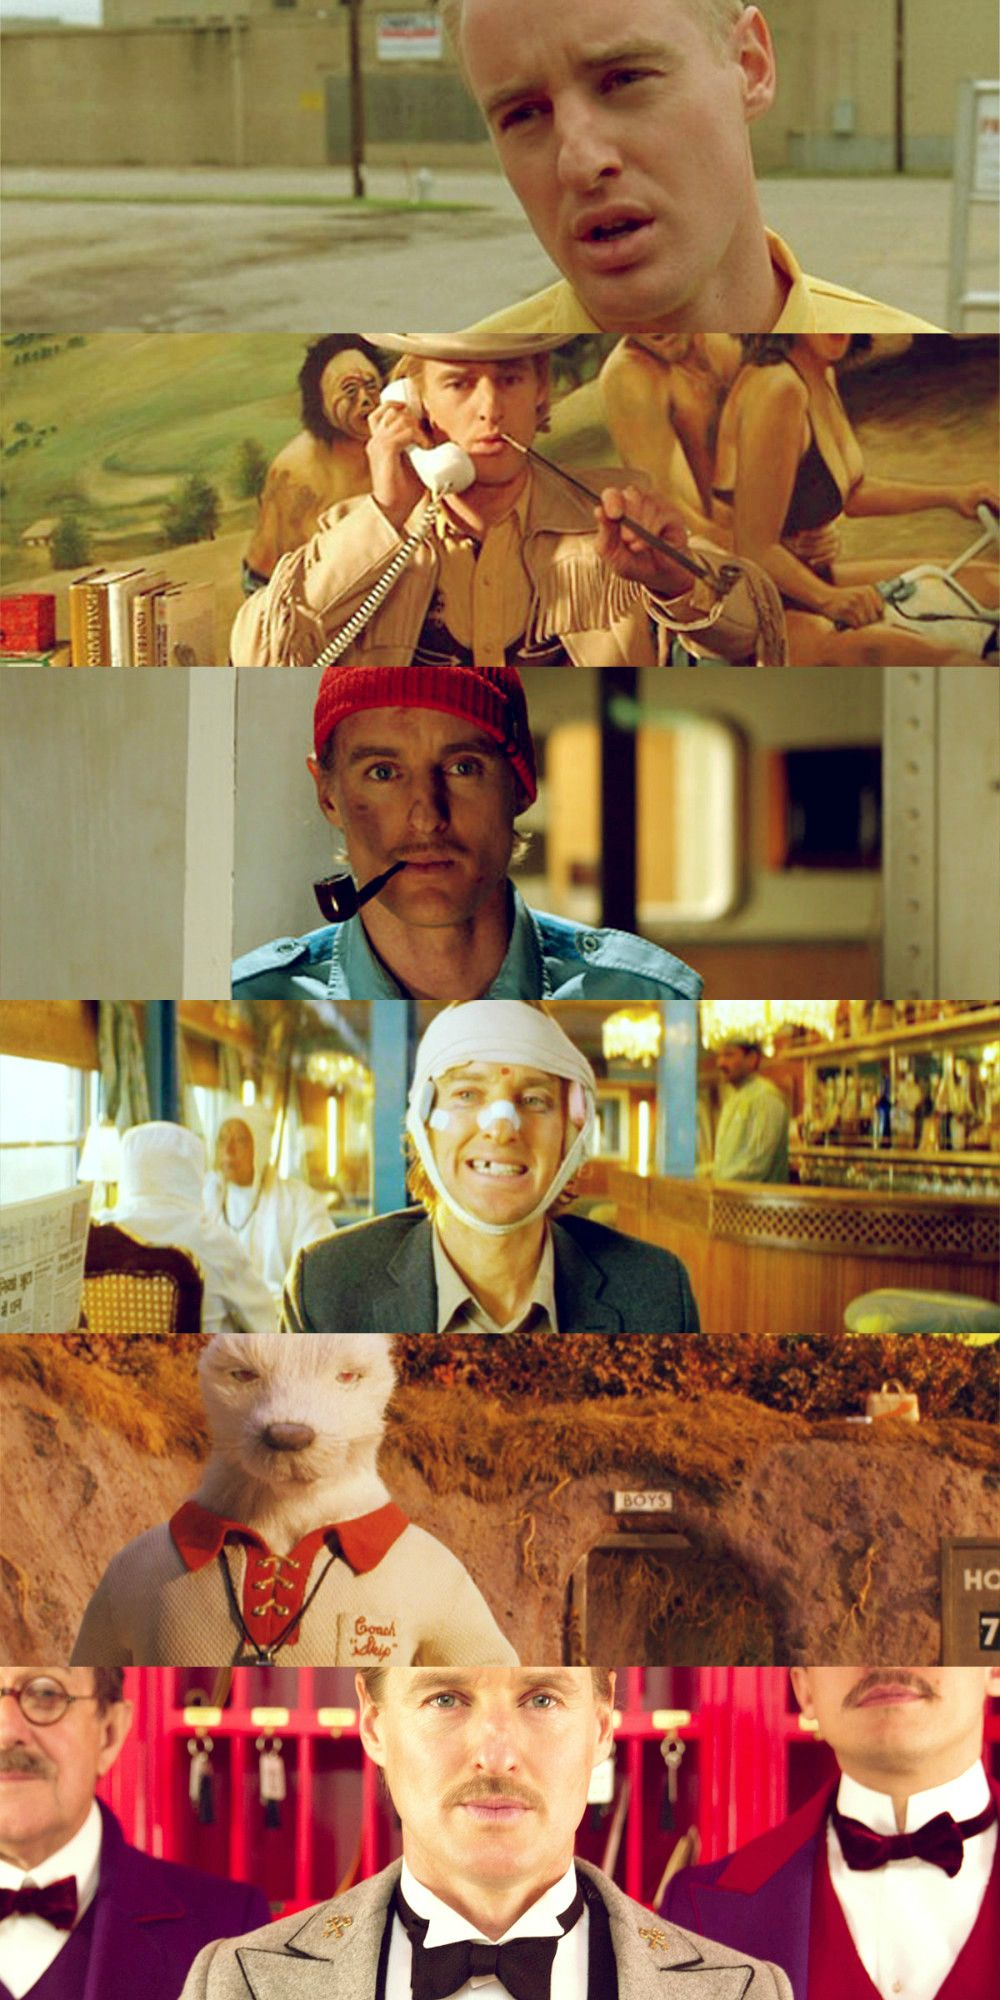 Owen Wilson Wes Anderson Movies הבלתי רשמיים Pinterest